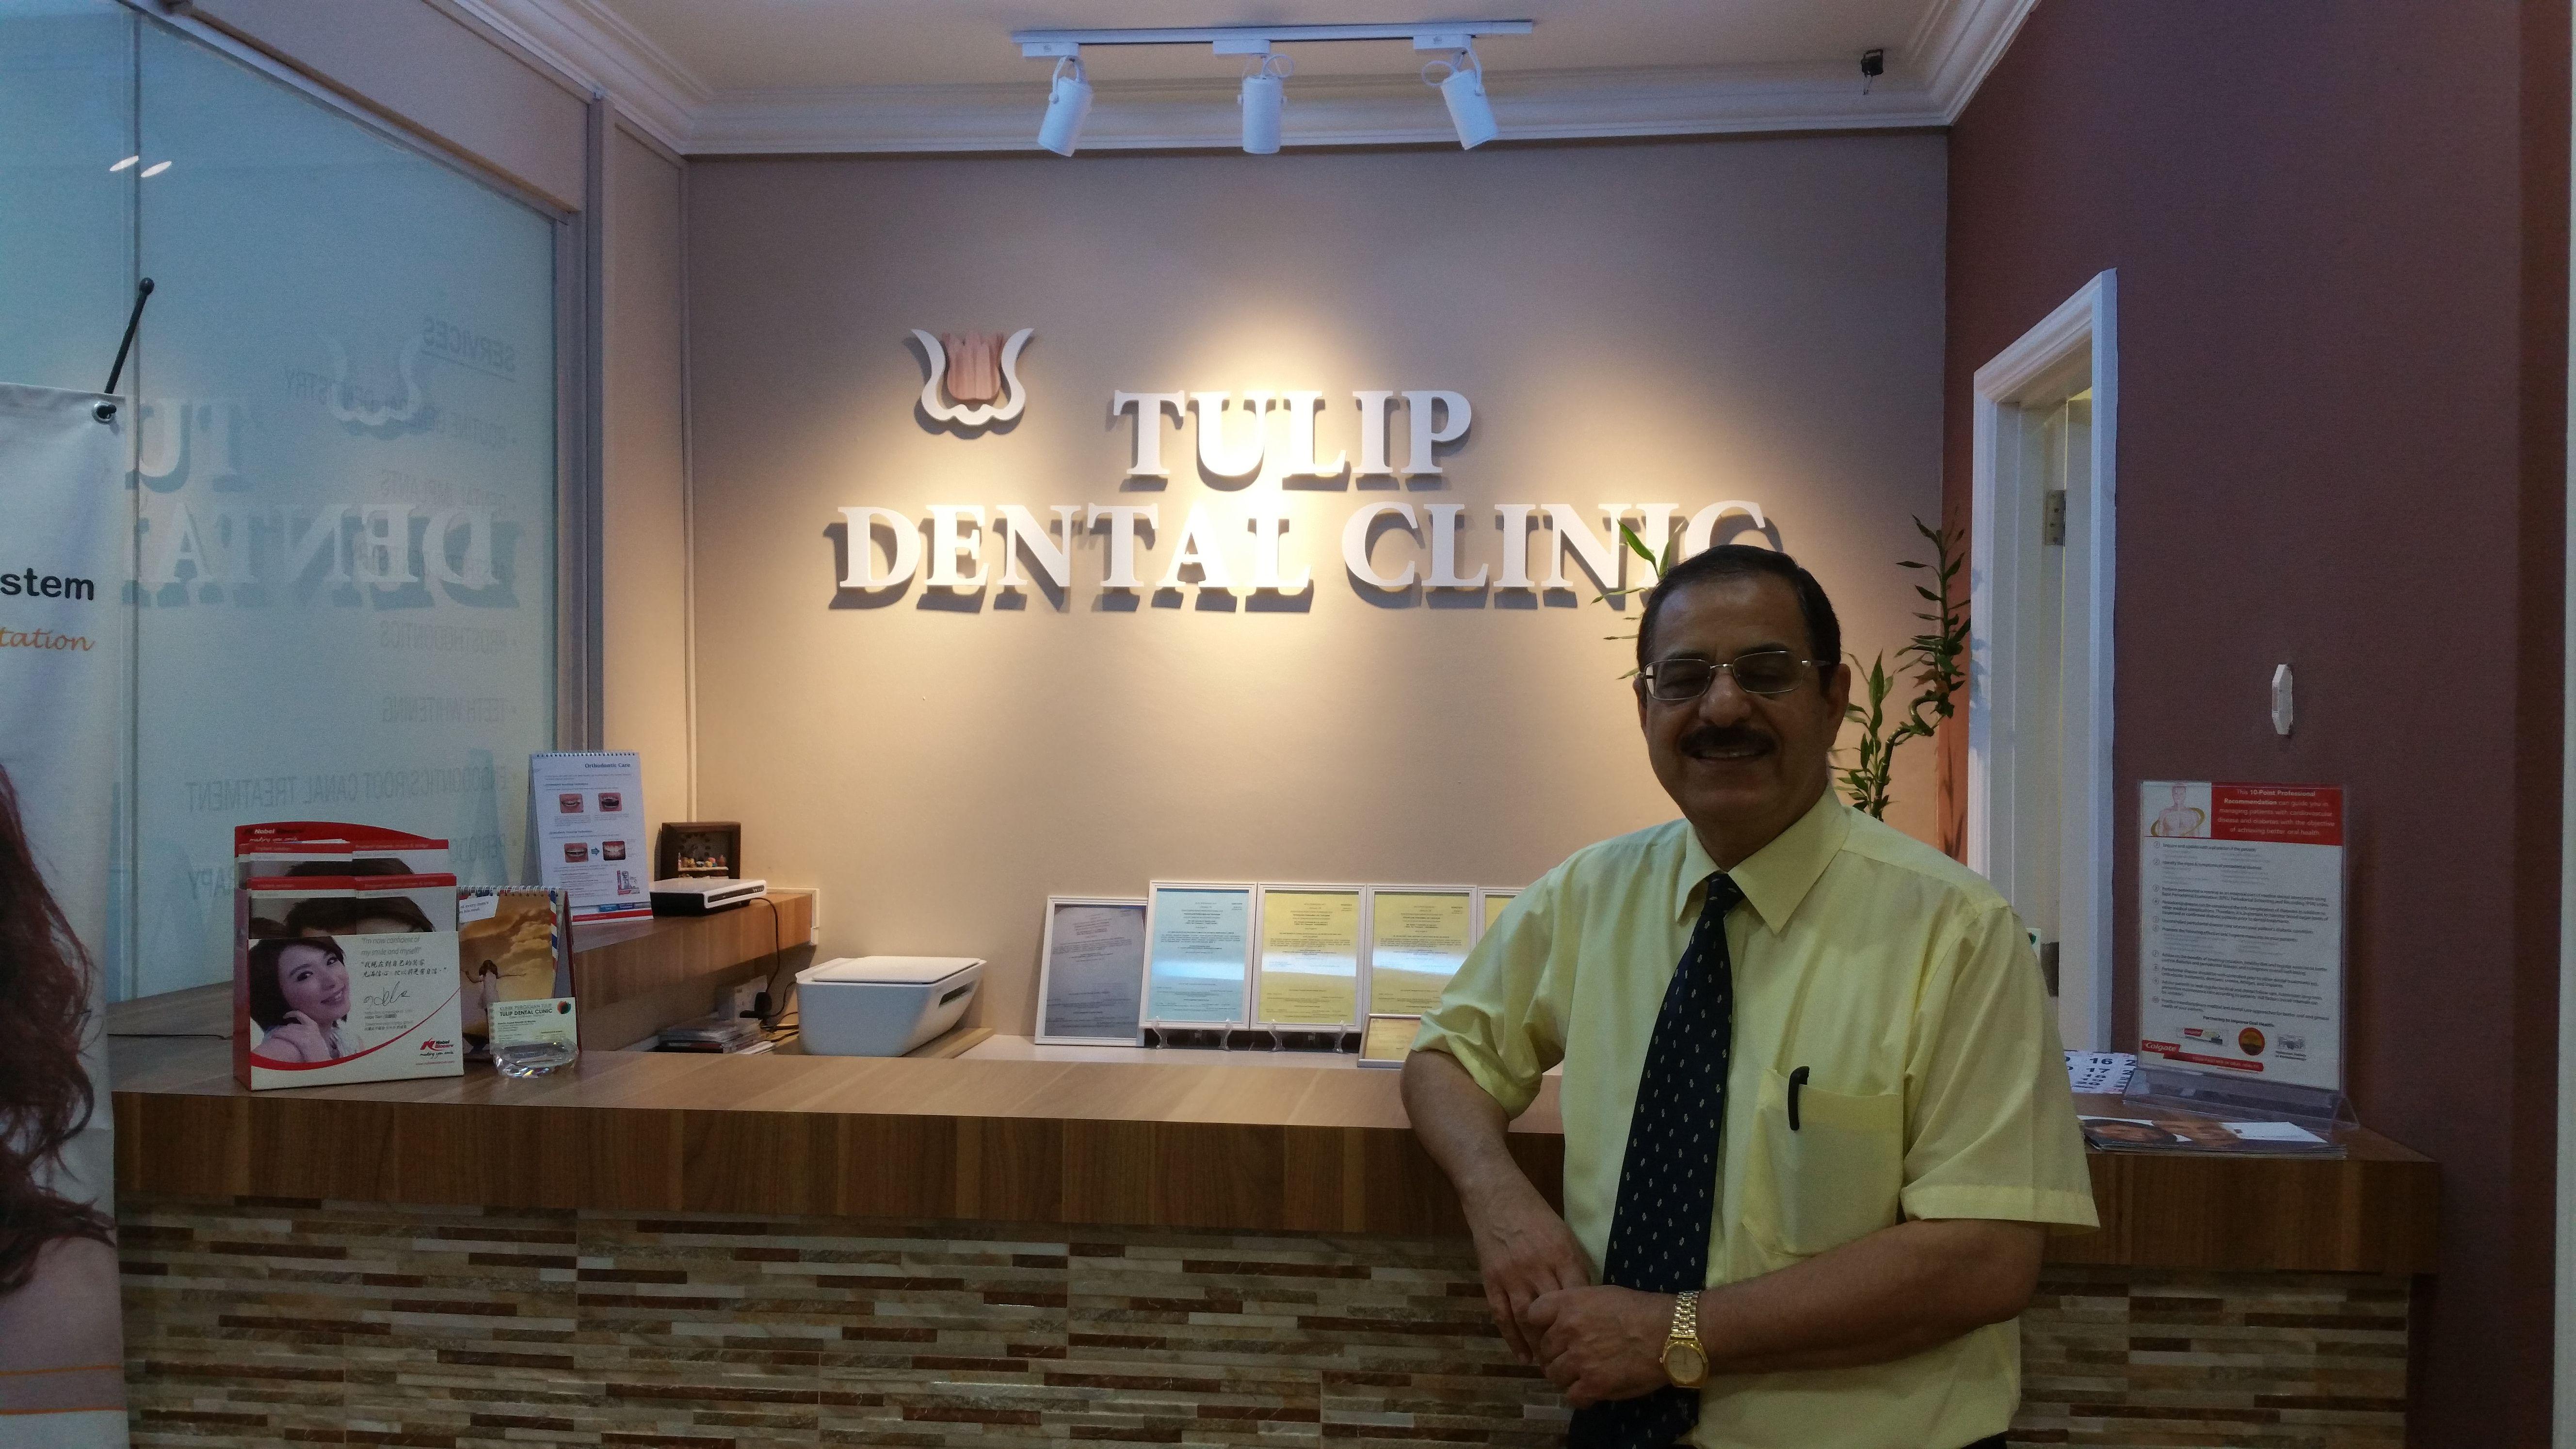 Tulip Dental Clinic